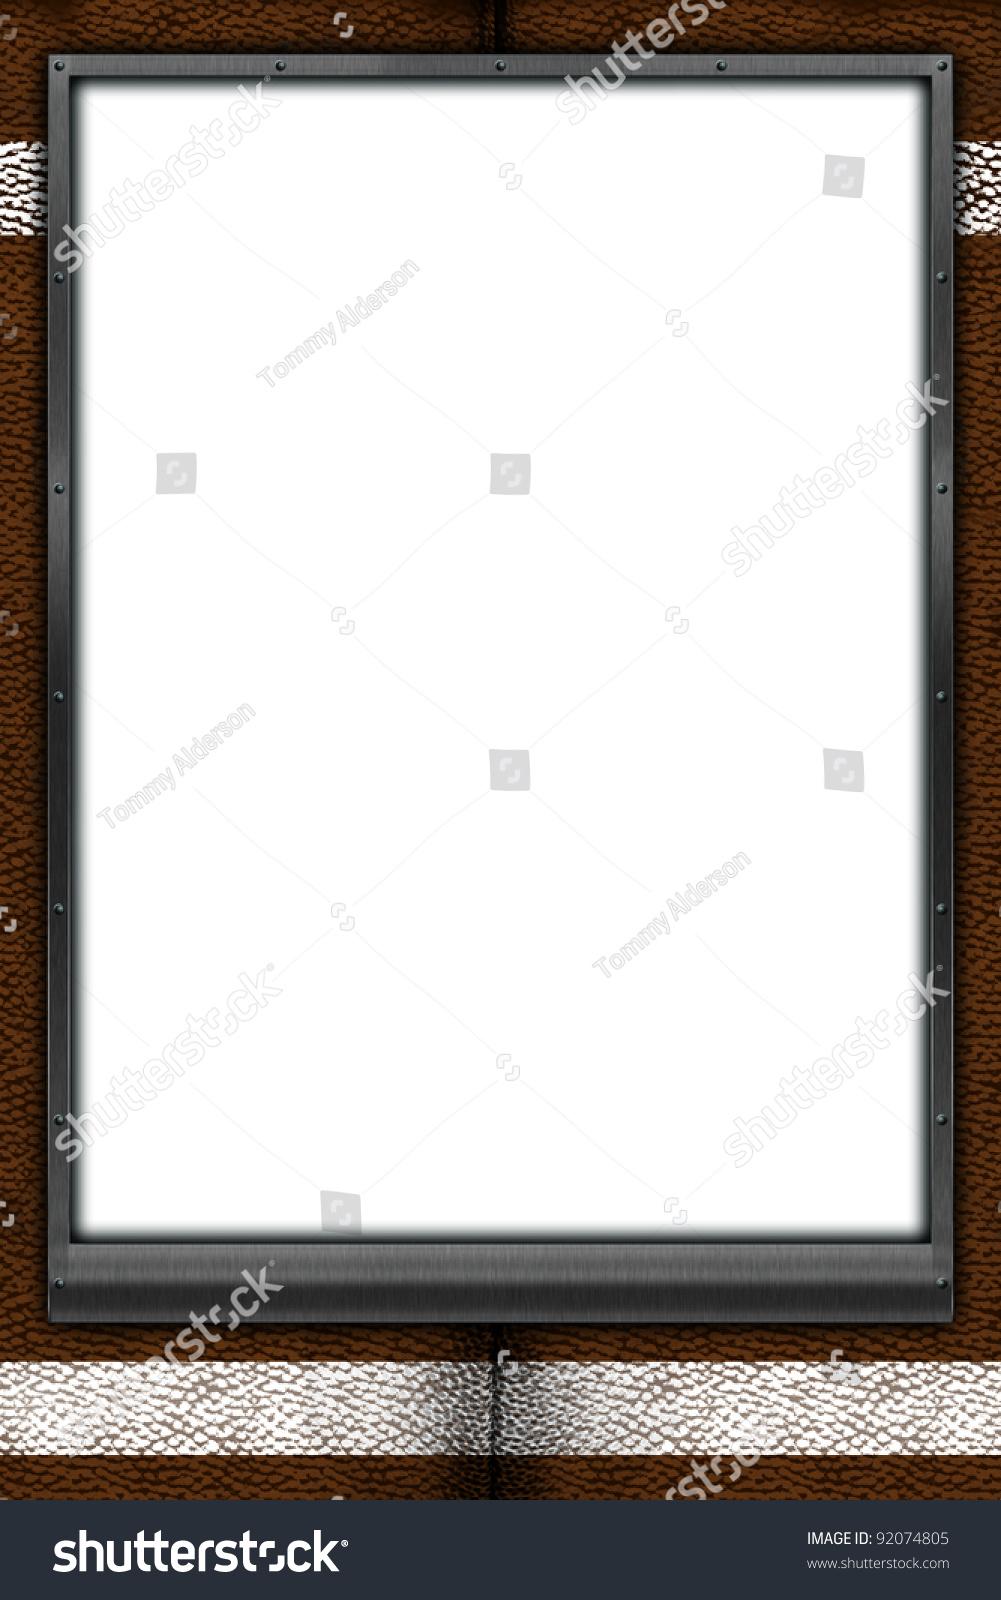 football themed mat frame 24x36 poster stock illustration 92074805 shutterstock. Black Bedroom Furniture Sets. Home Design Ideas